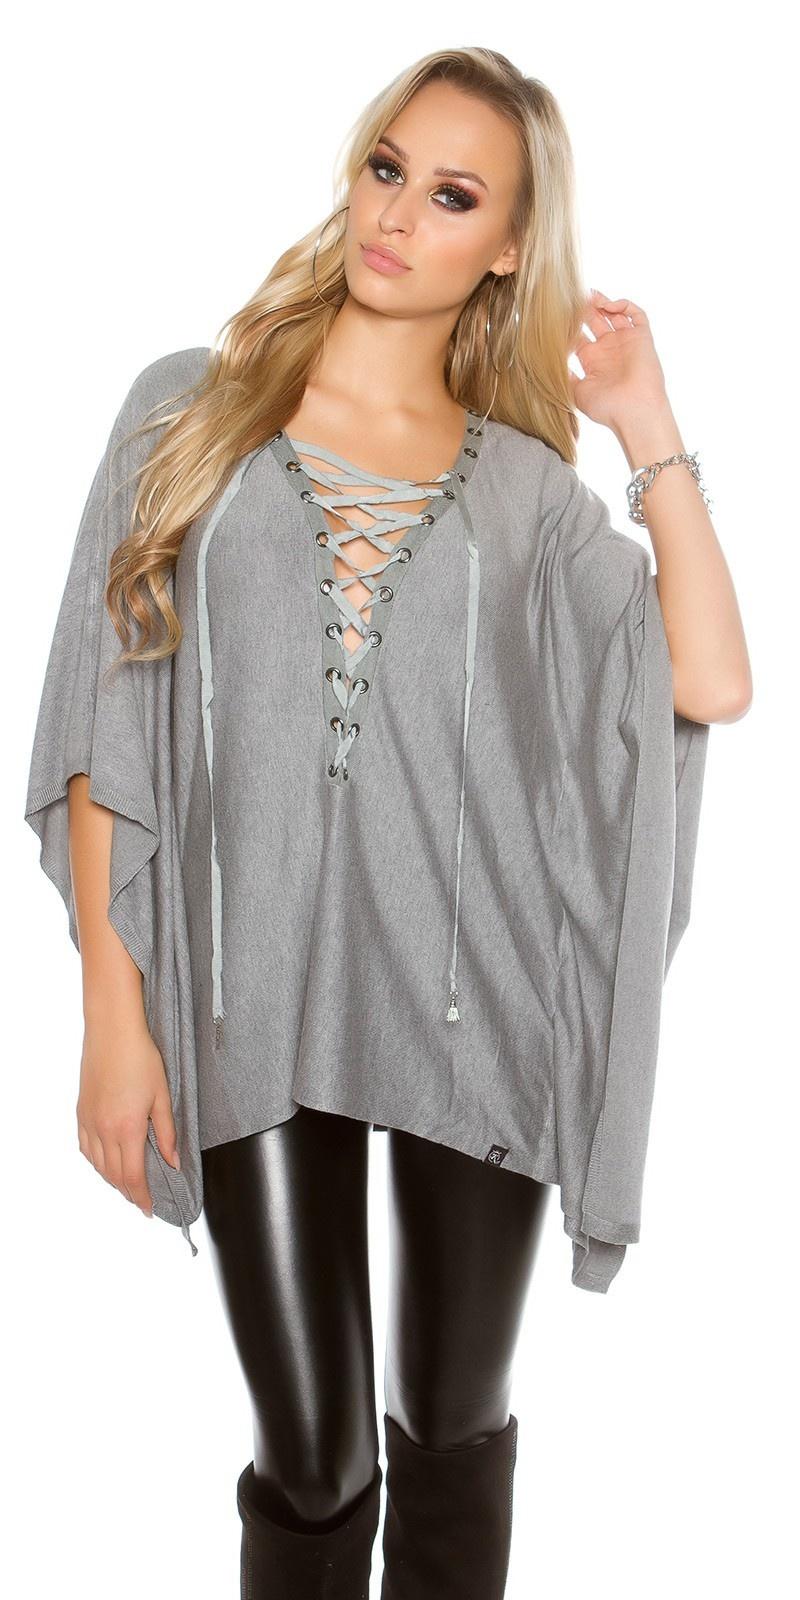 Trendy vleermuis - poncho look trui grijs